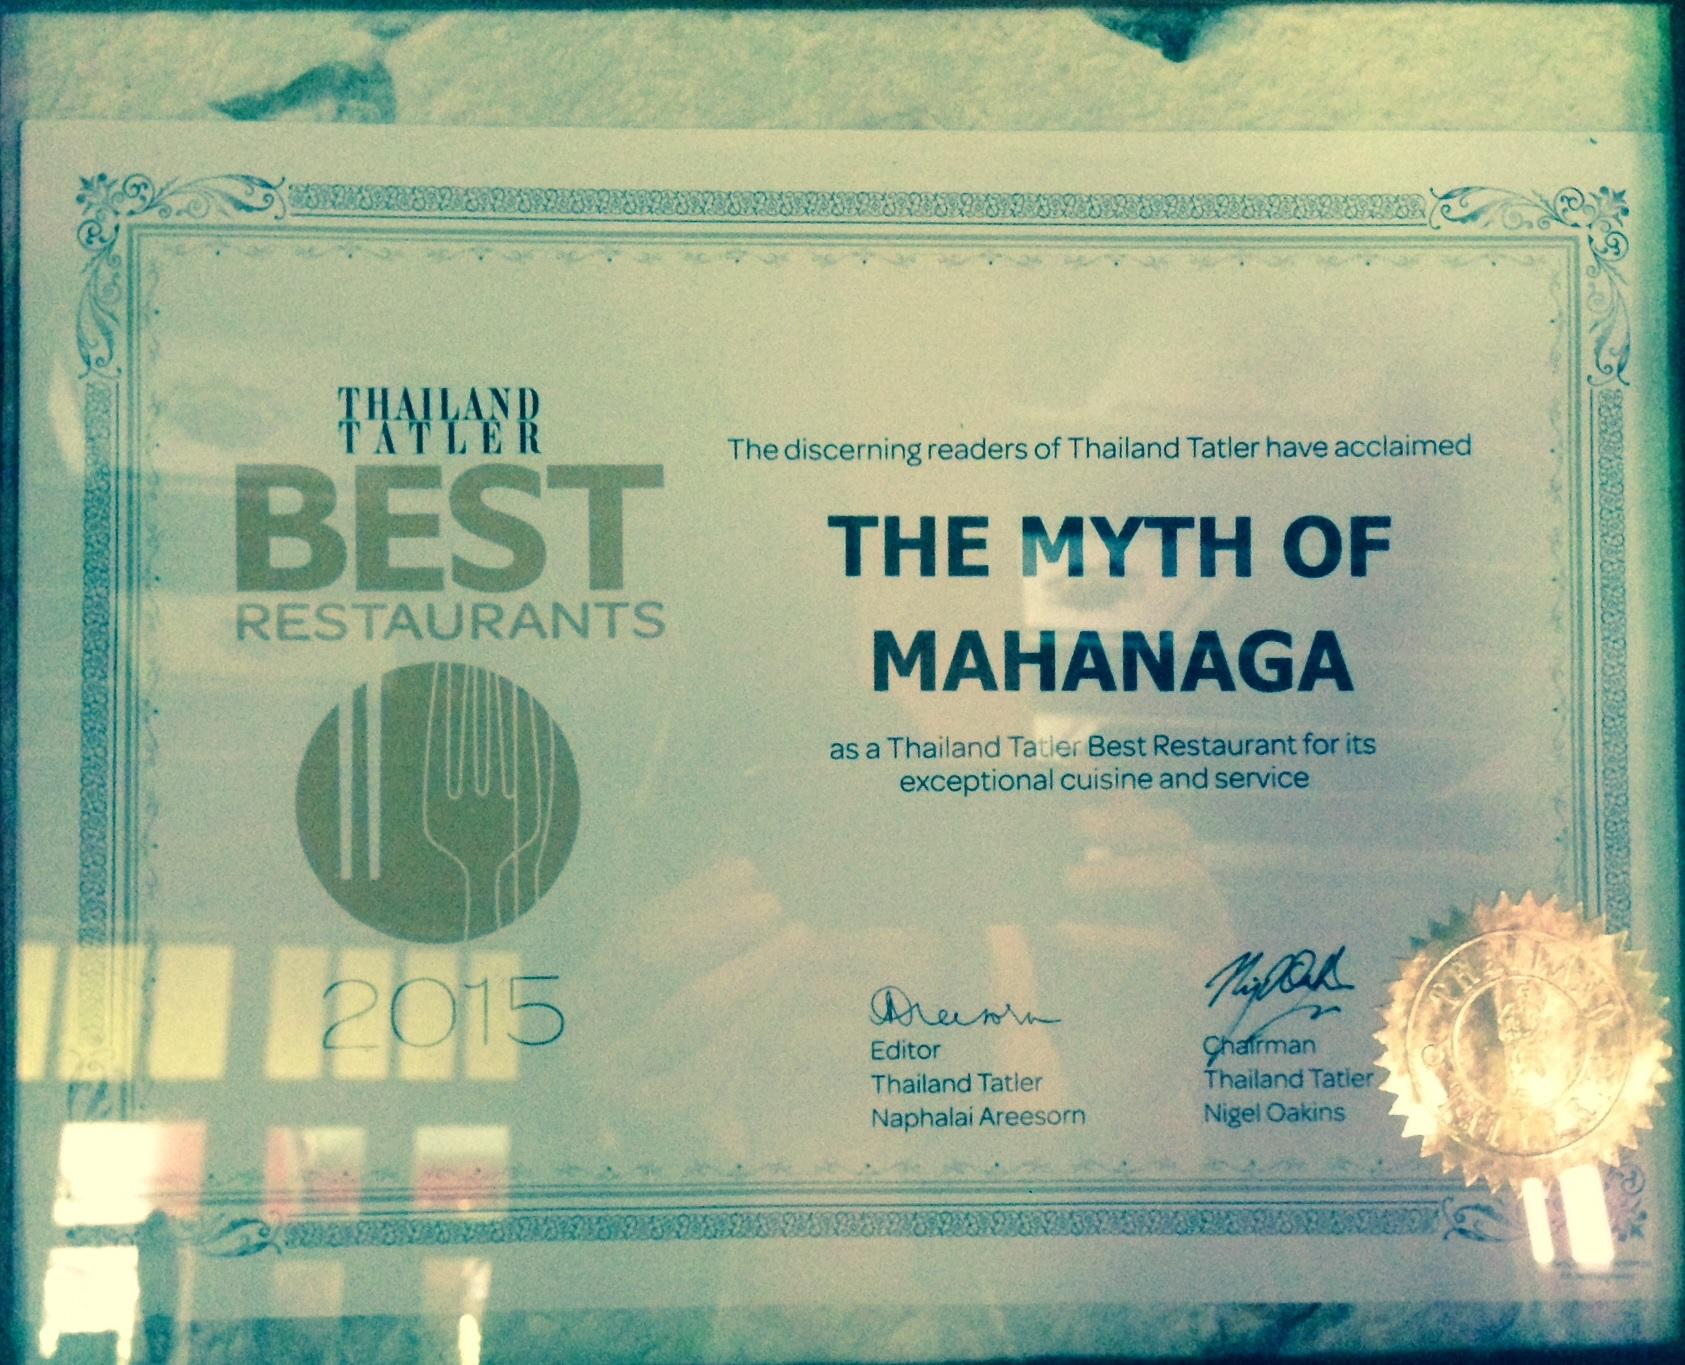 MahaNaga-Thailand Tattler Best Restaurant Awards 2015